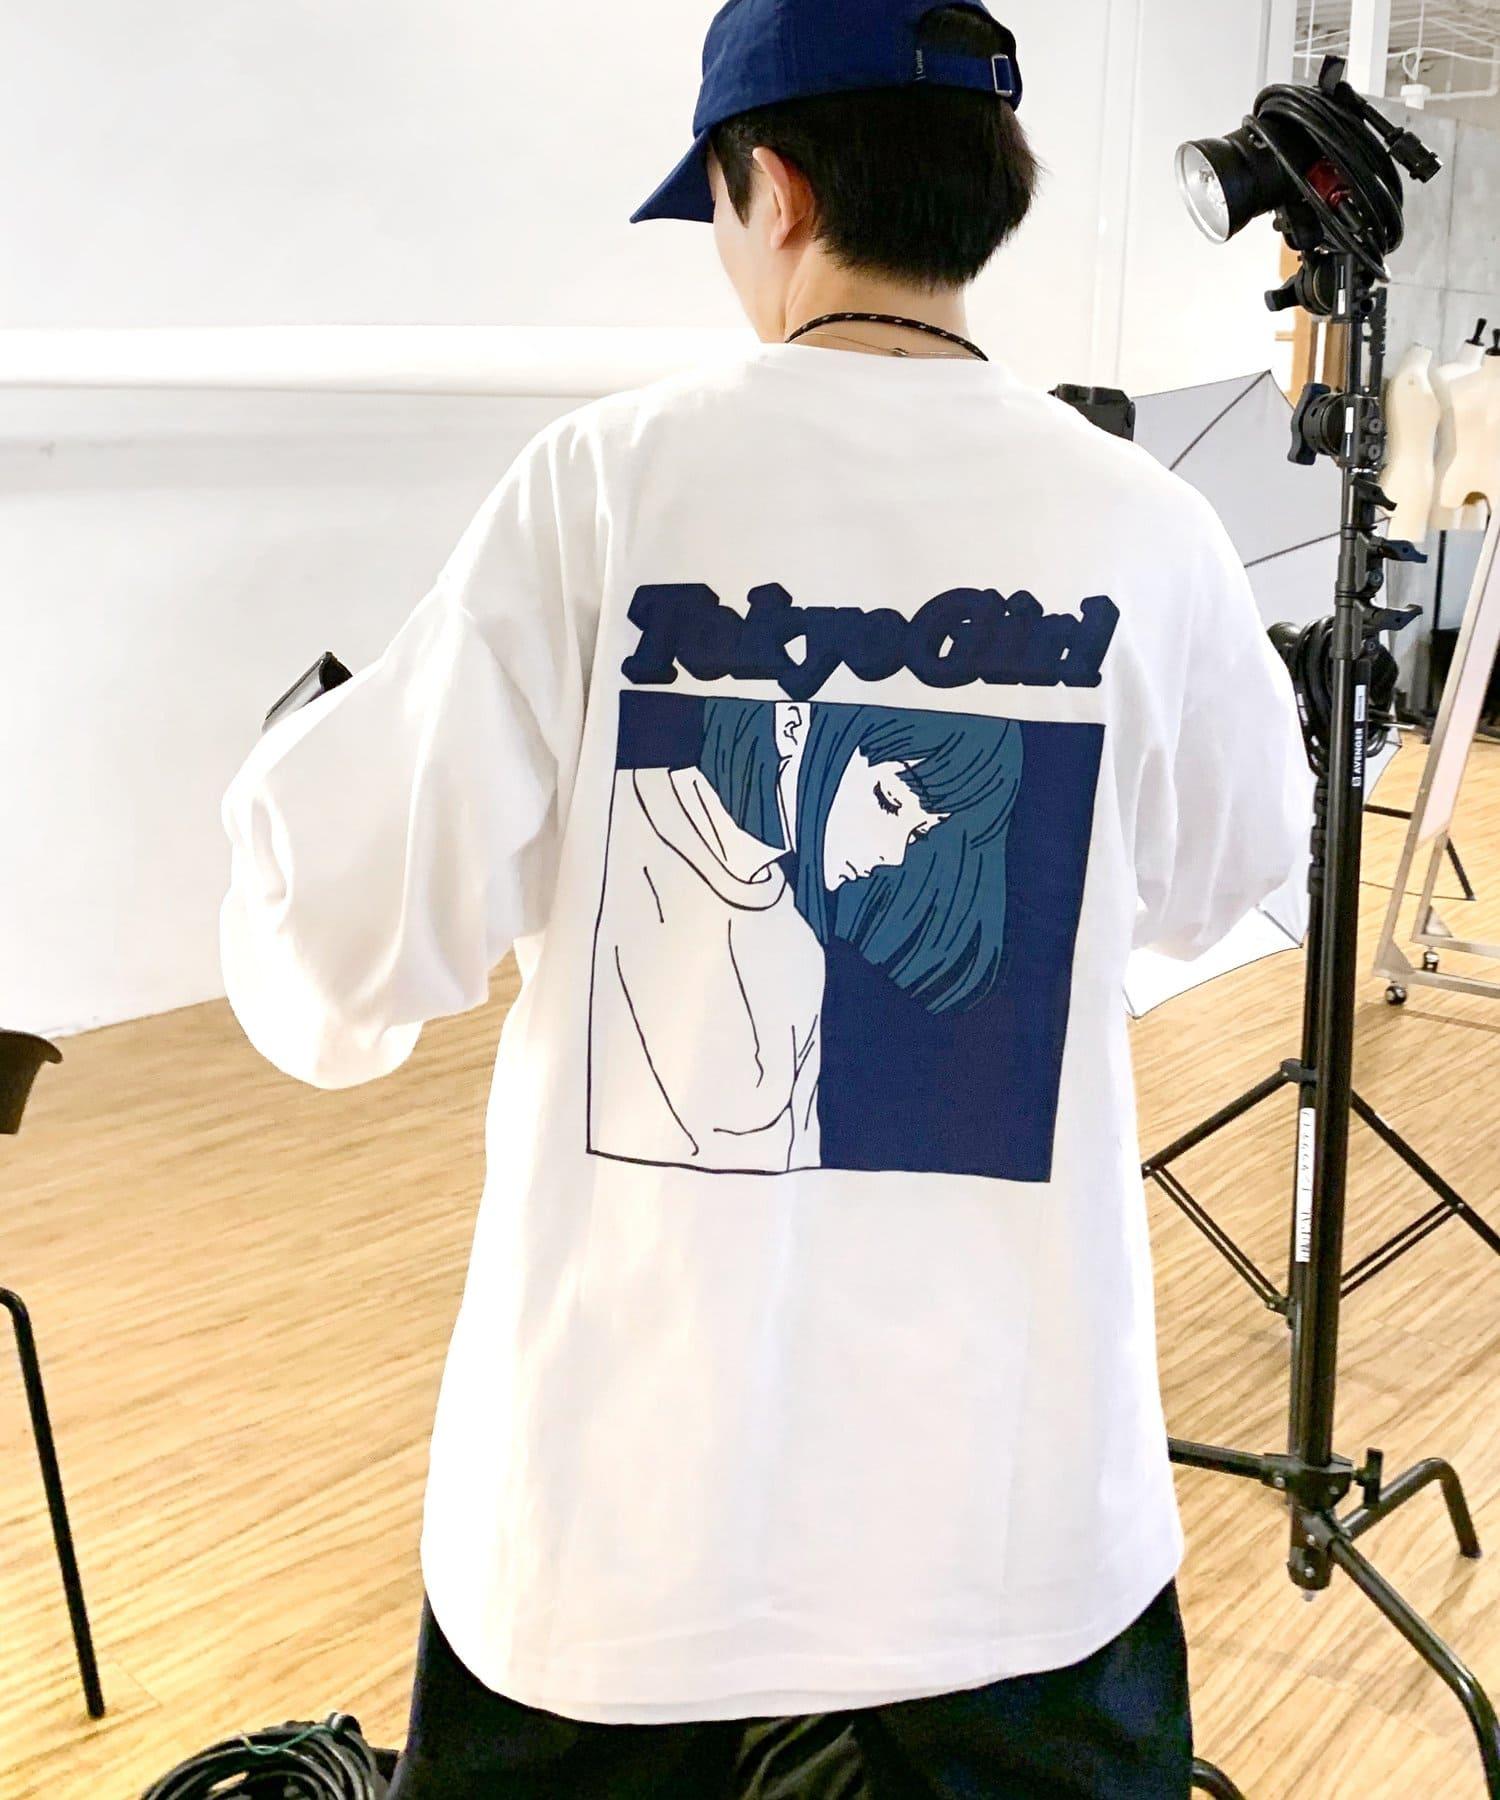 WHO'S WHO gallery(フーズフーギャラリー) 《WEB限定》東京ガール カラーフレーム ロンTEE